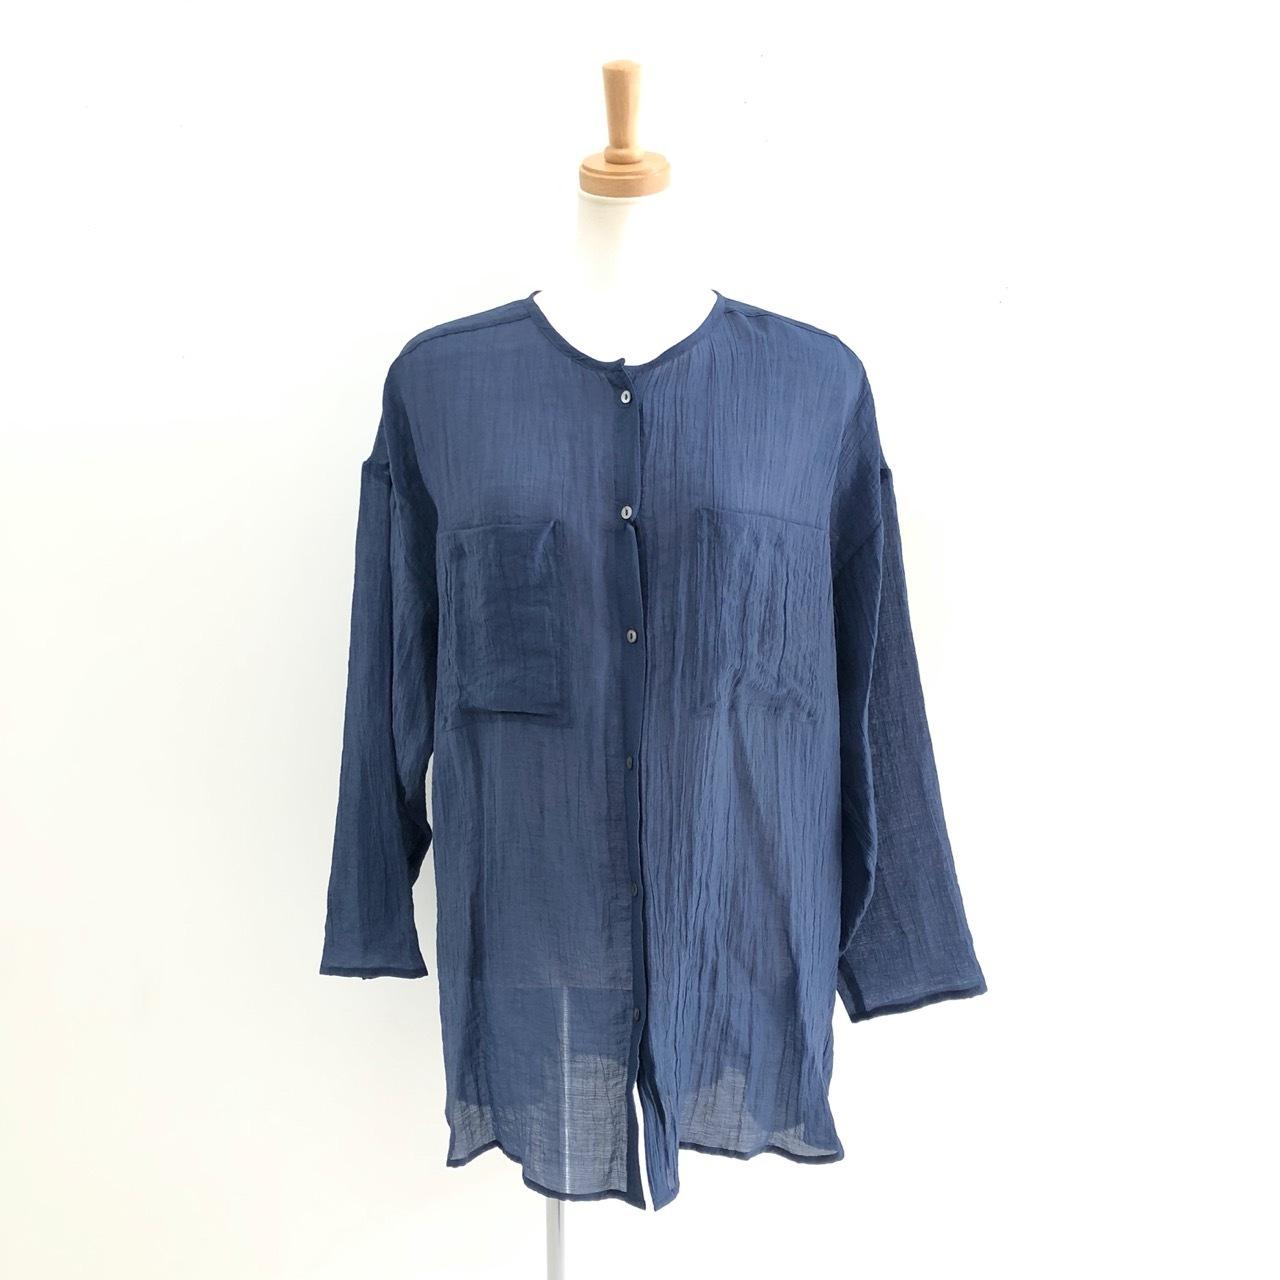 【 Chignonstar 】- 1601-067 - ワッシャーシアーシャツ